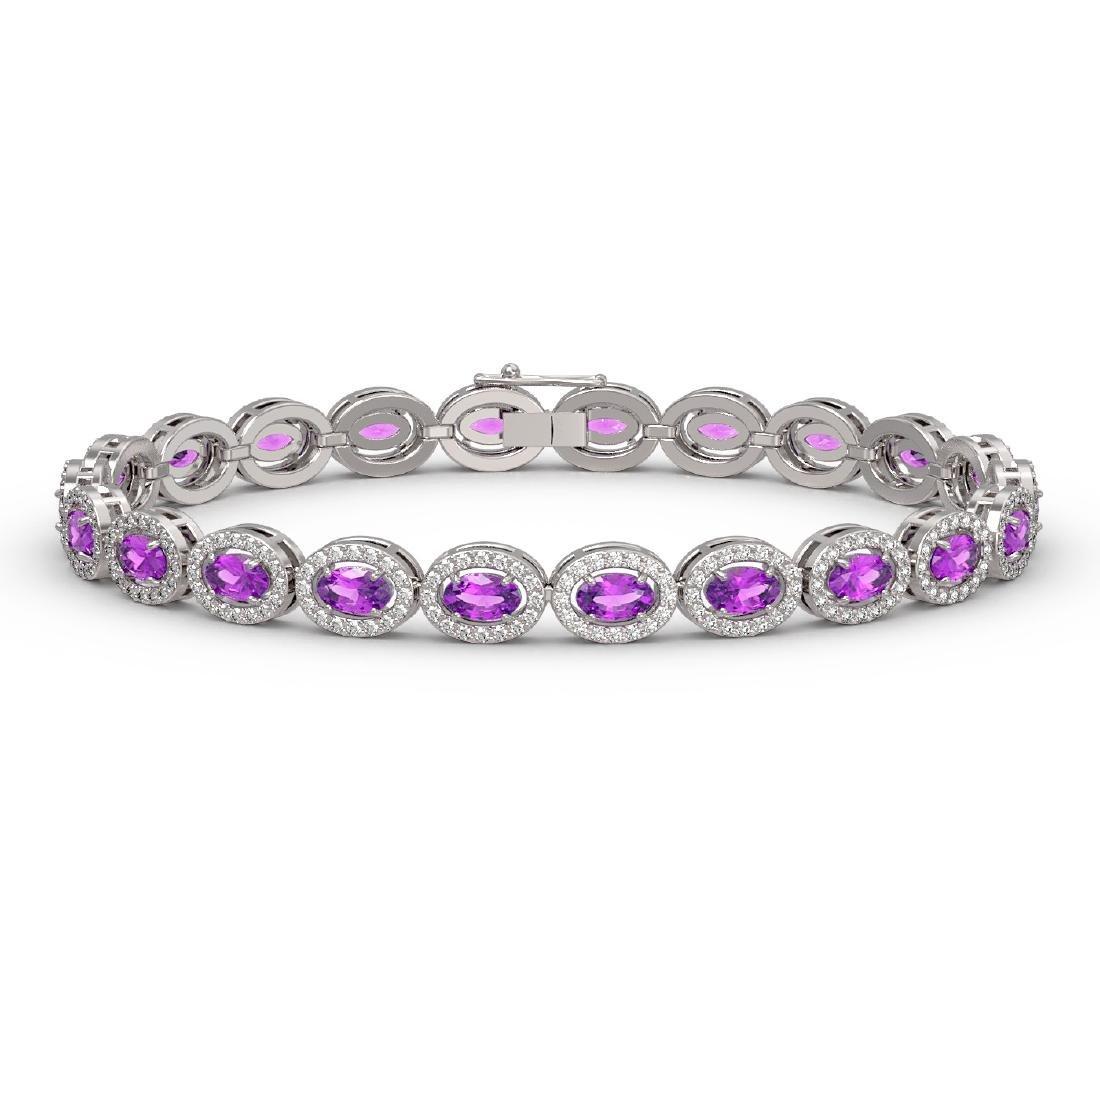 10.05 CTW Amethyst & Diamond Halo Bracelet 10K White